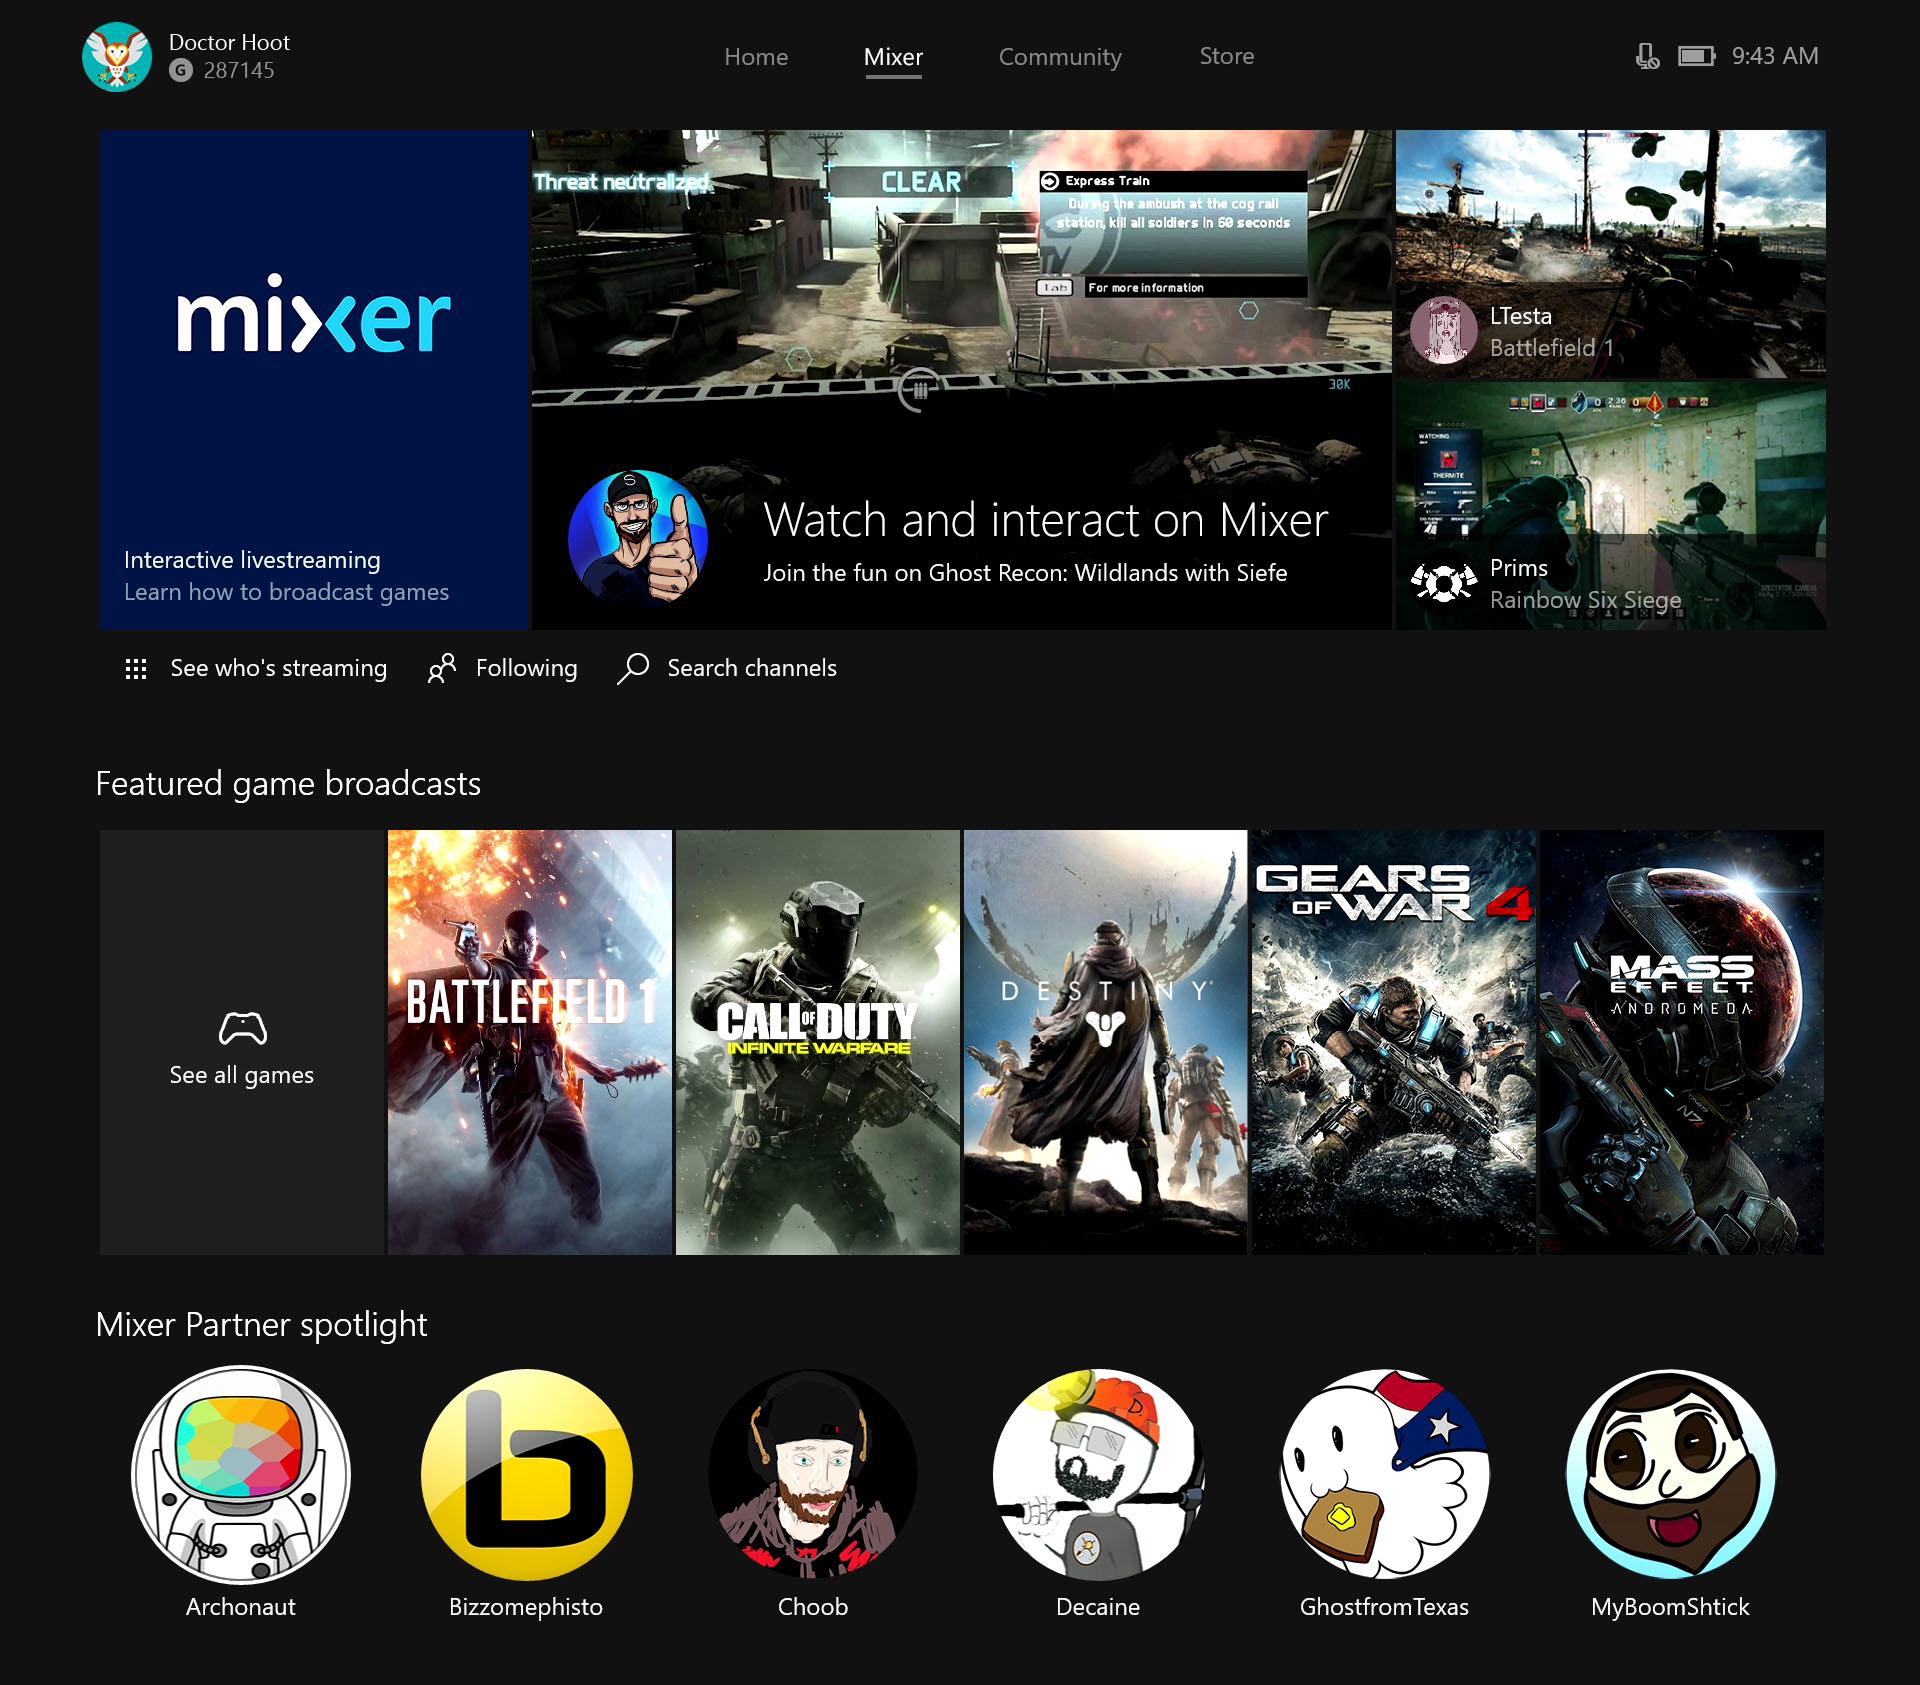 Mixer la plataforma Streamer de Microsoft que rivalizara Twitch.